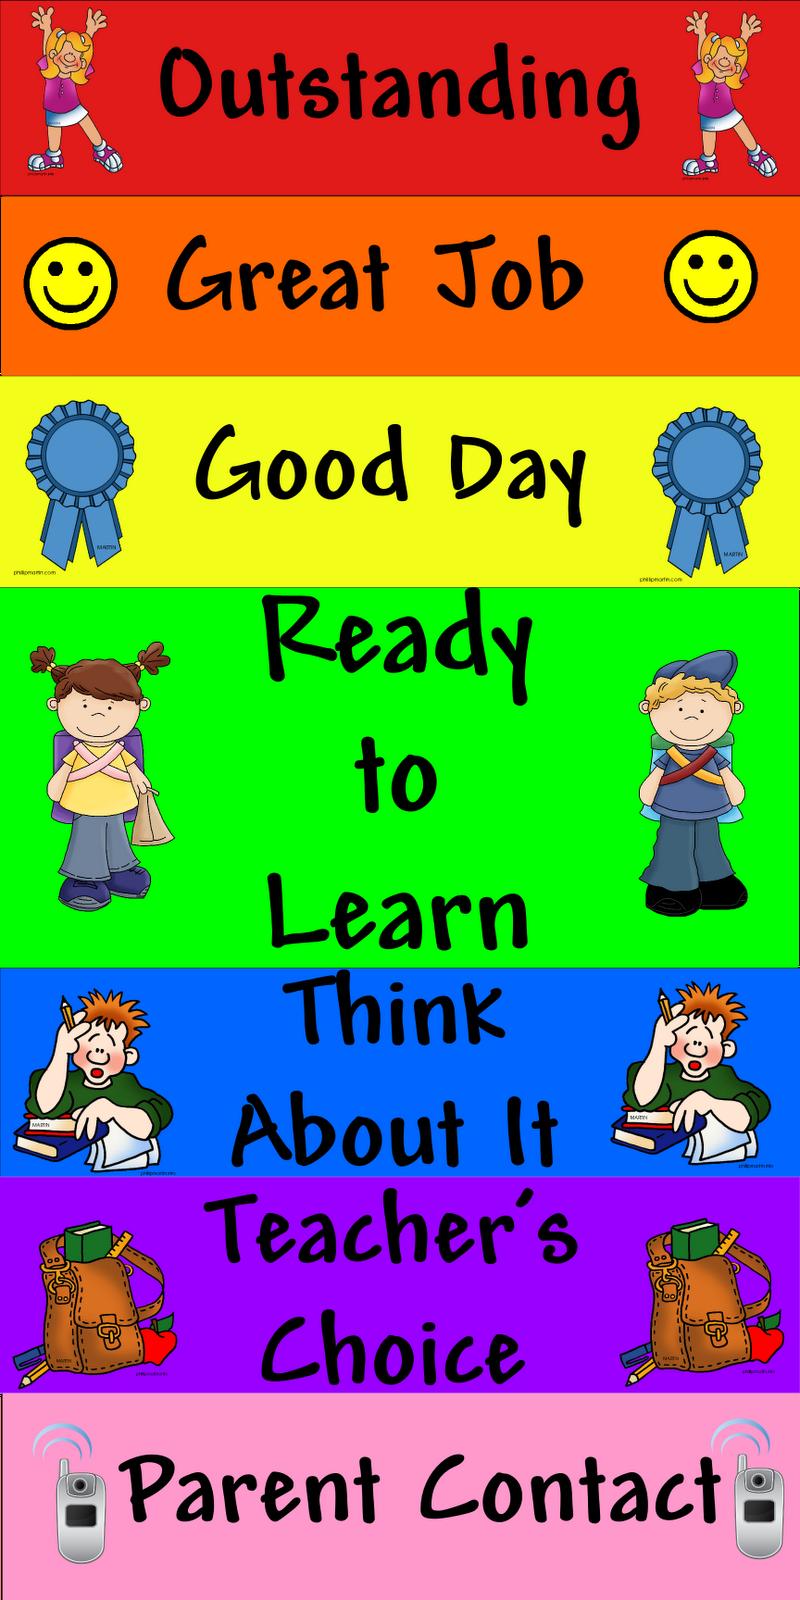 Free Bad Behavior Cliparts, Download Free Clip Art, Free ...